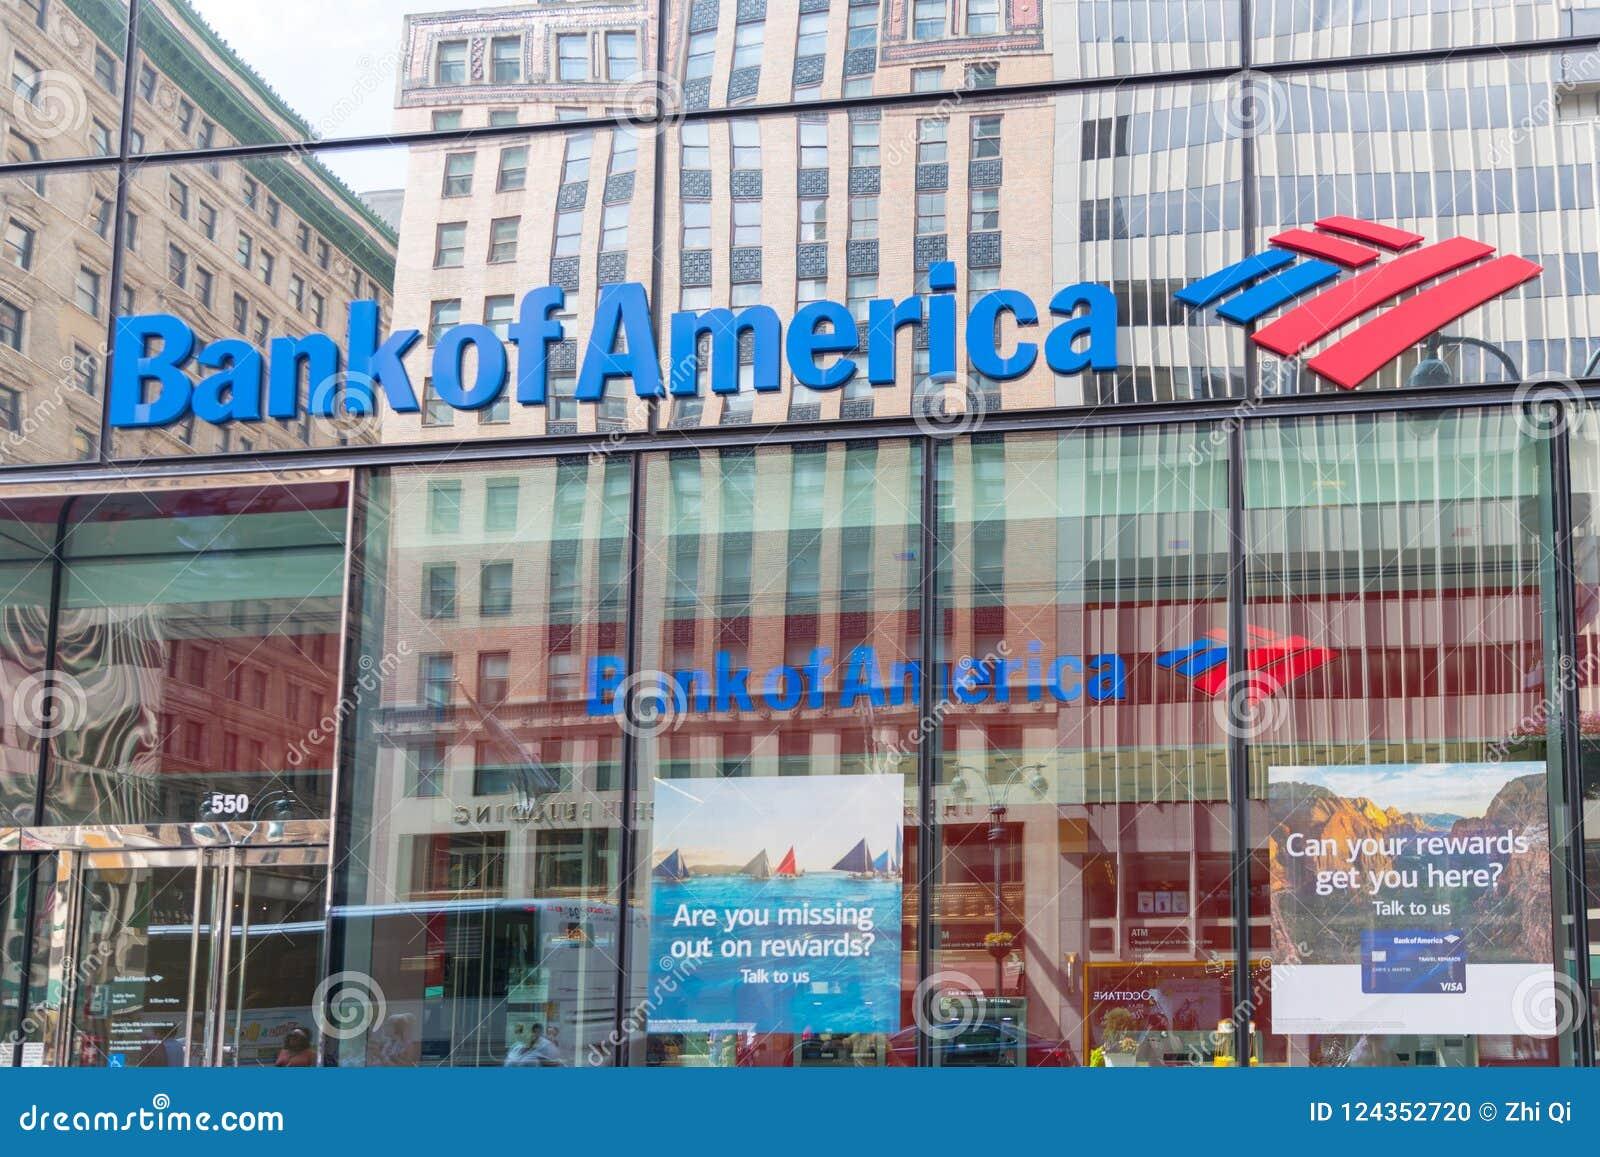 Logo of Bank of America in modern office building in New York.